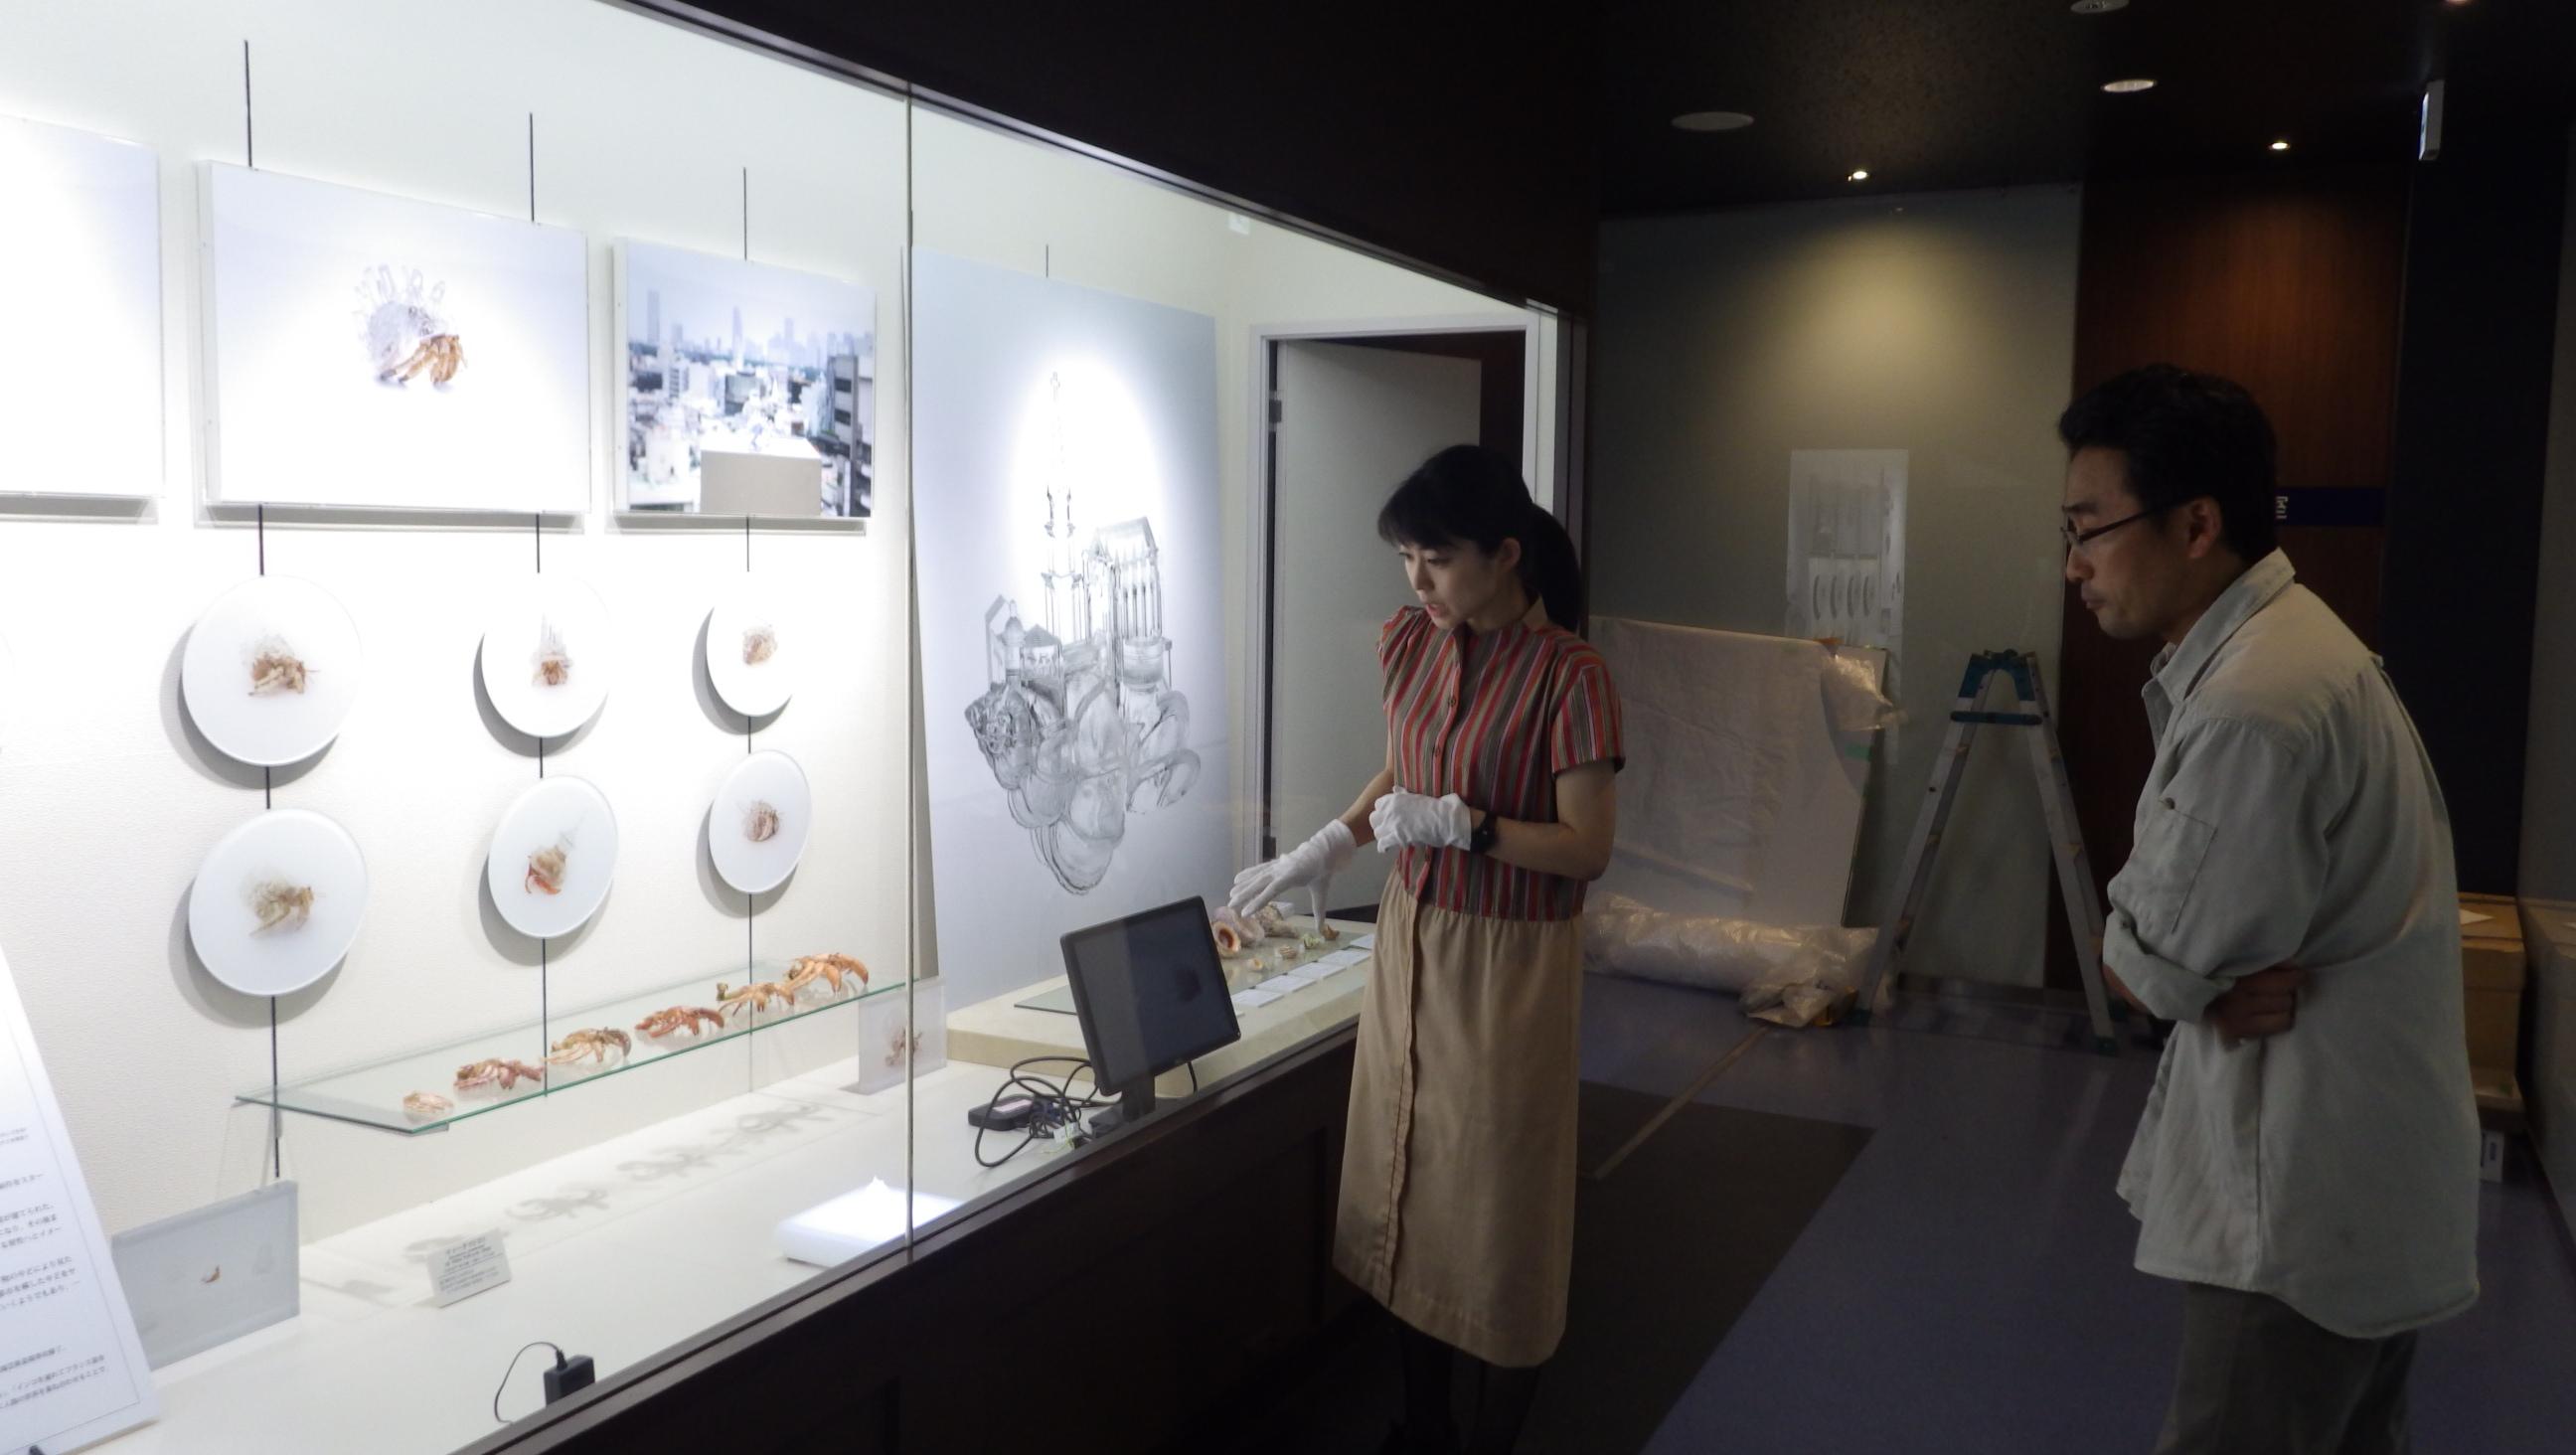 Exhibition: 白浜水族館 企画展「ヤドカリと貝殻 -生態と芸術-」